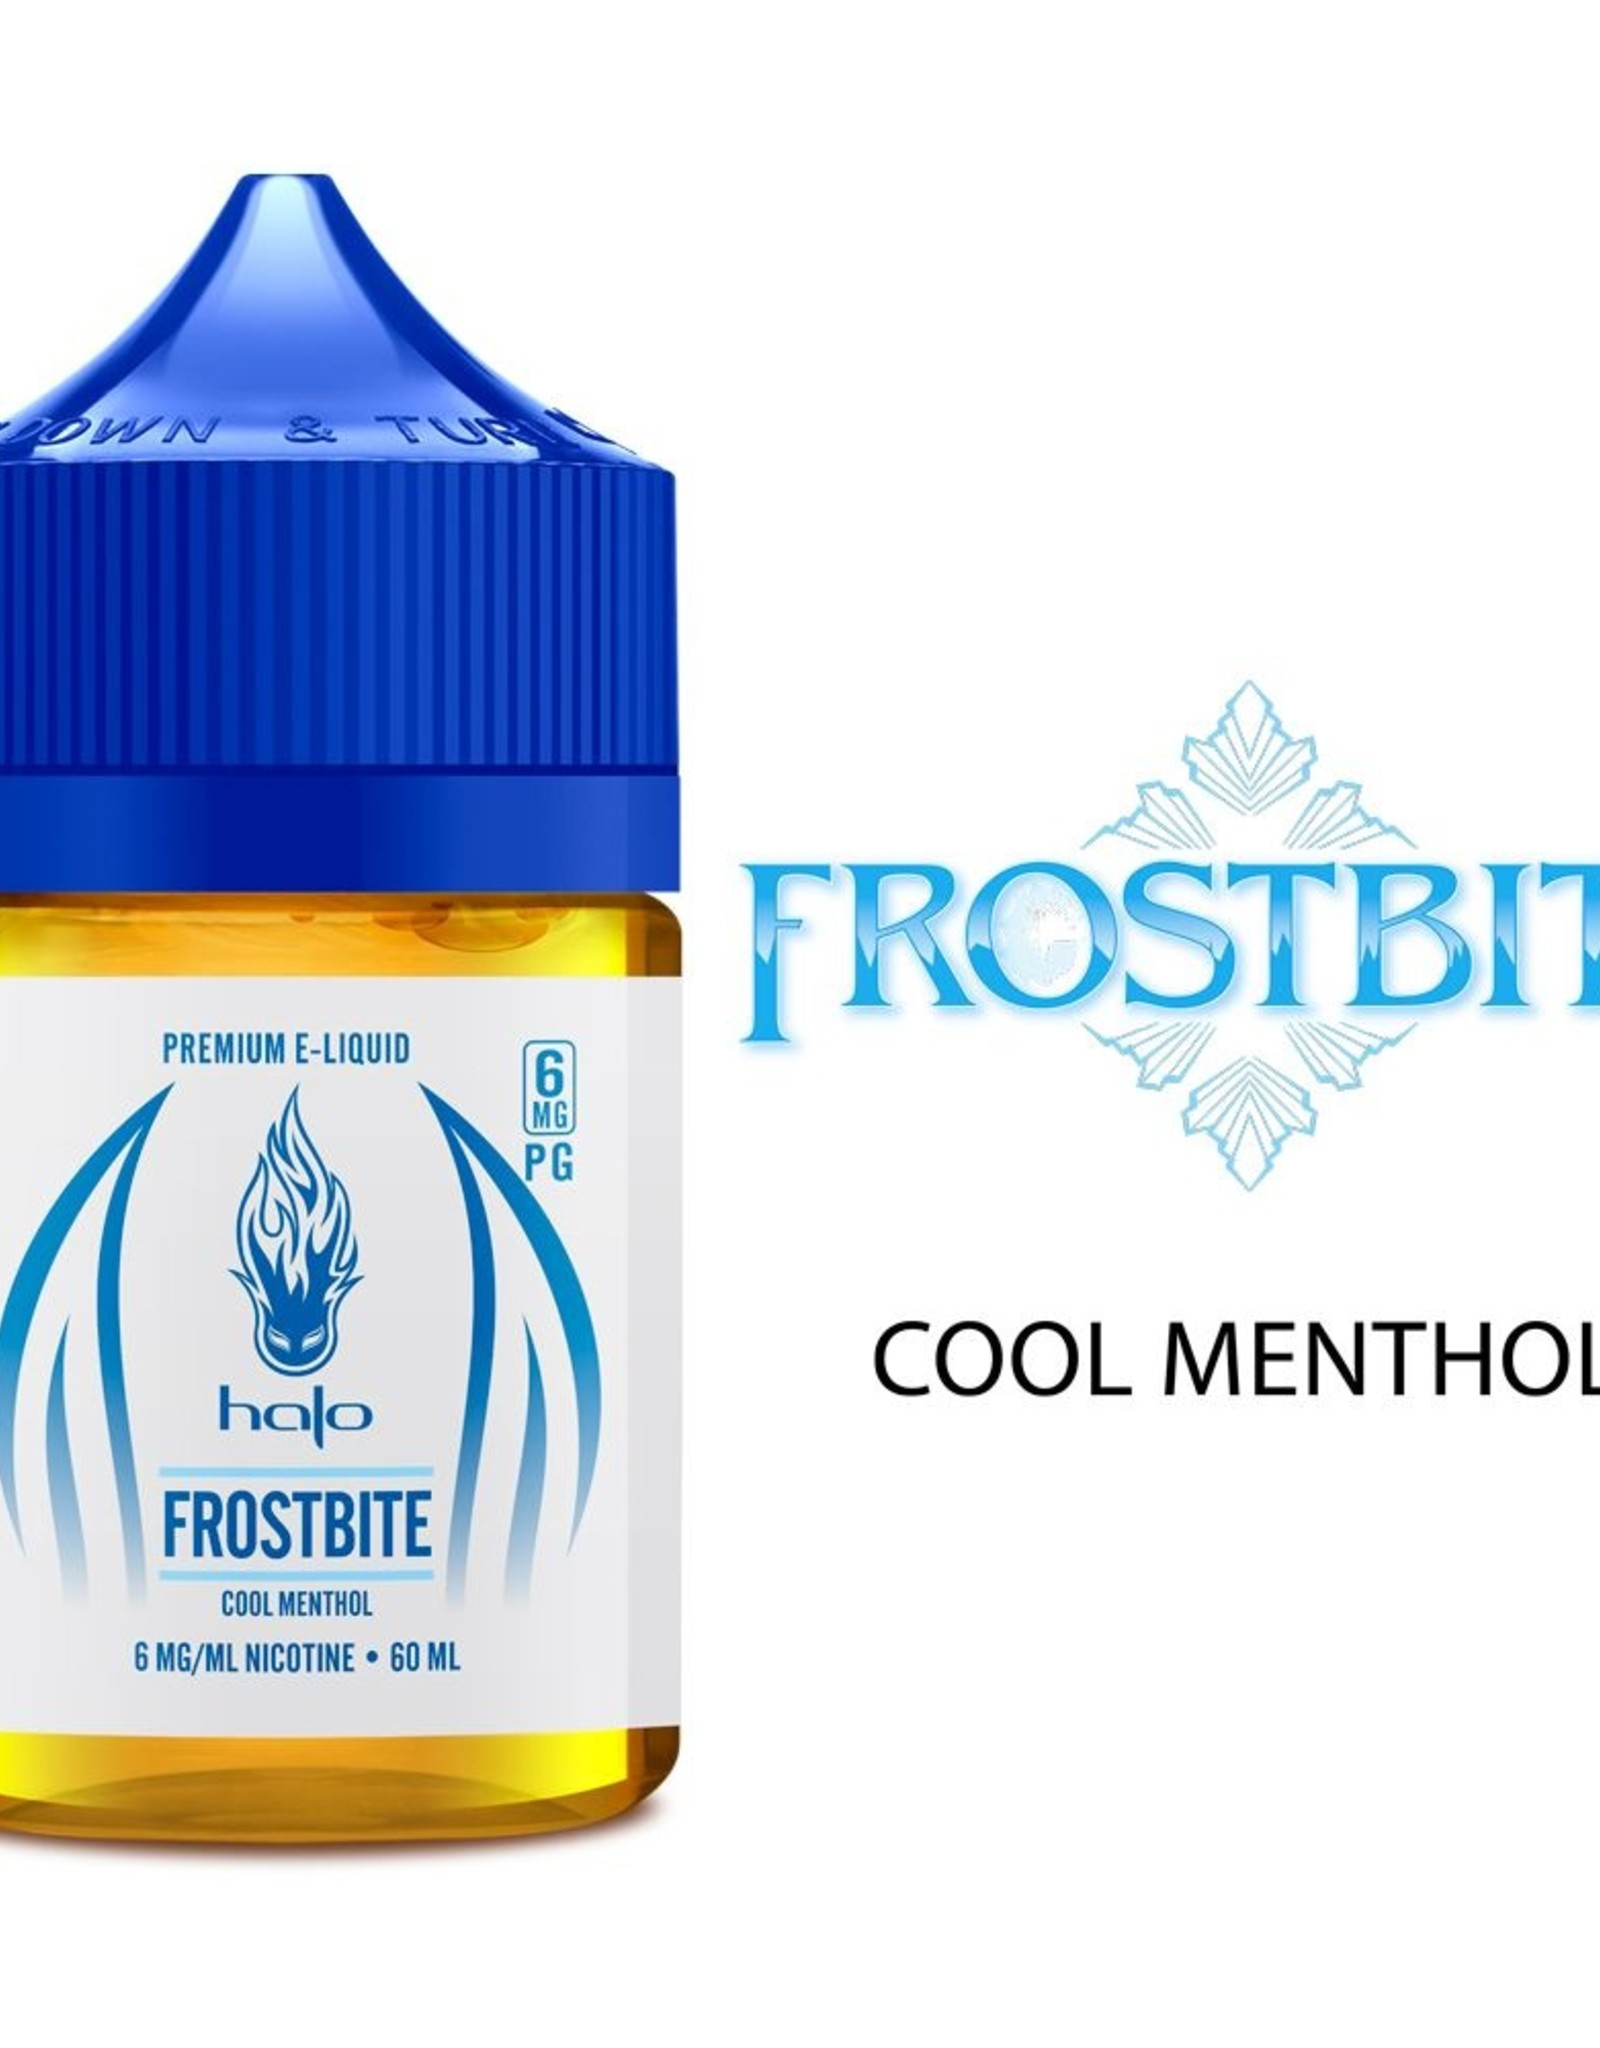 Halo Frostbite